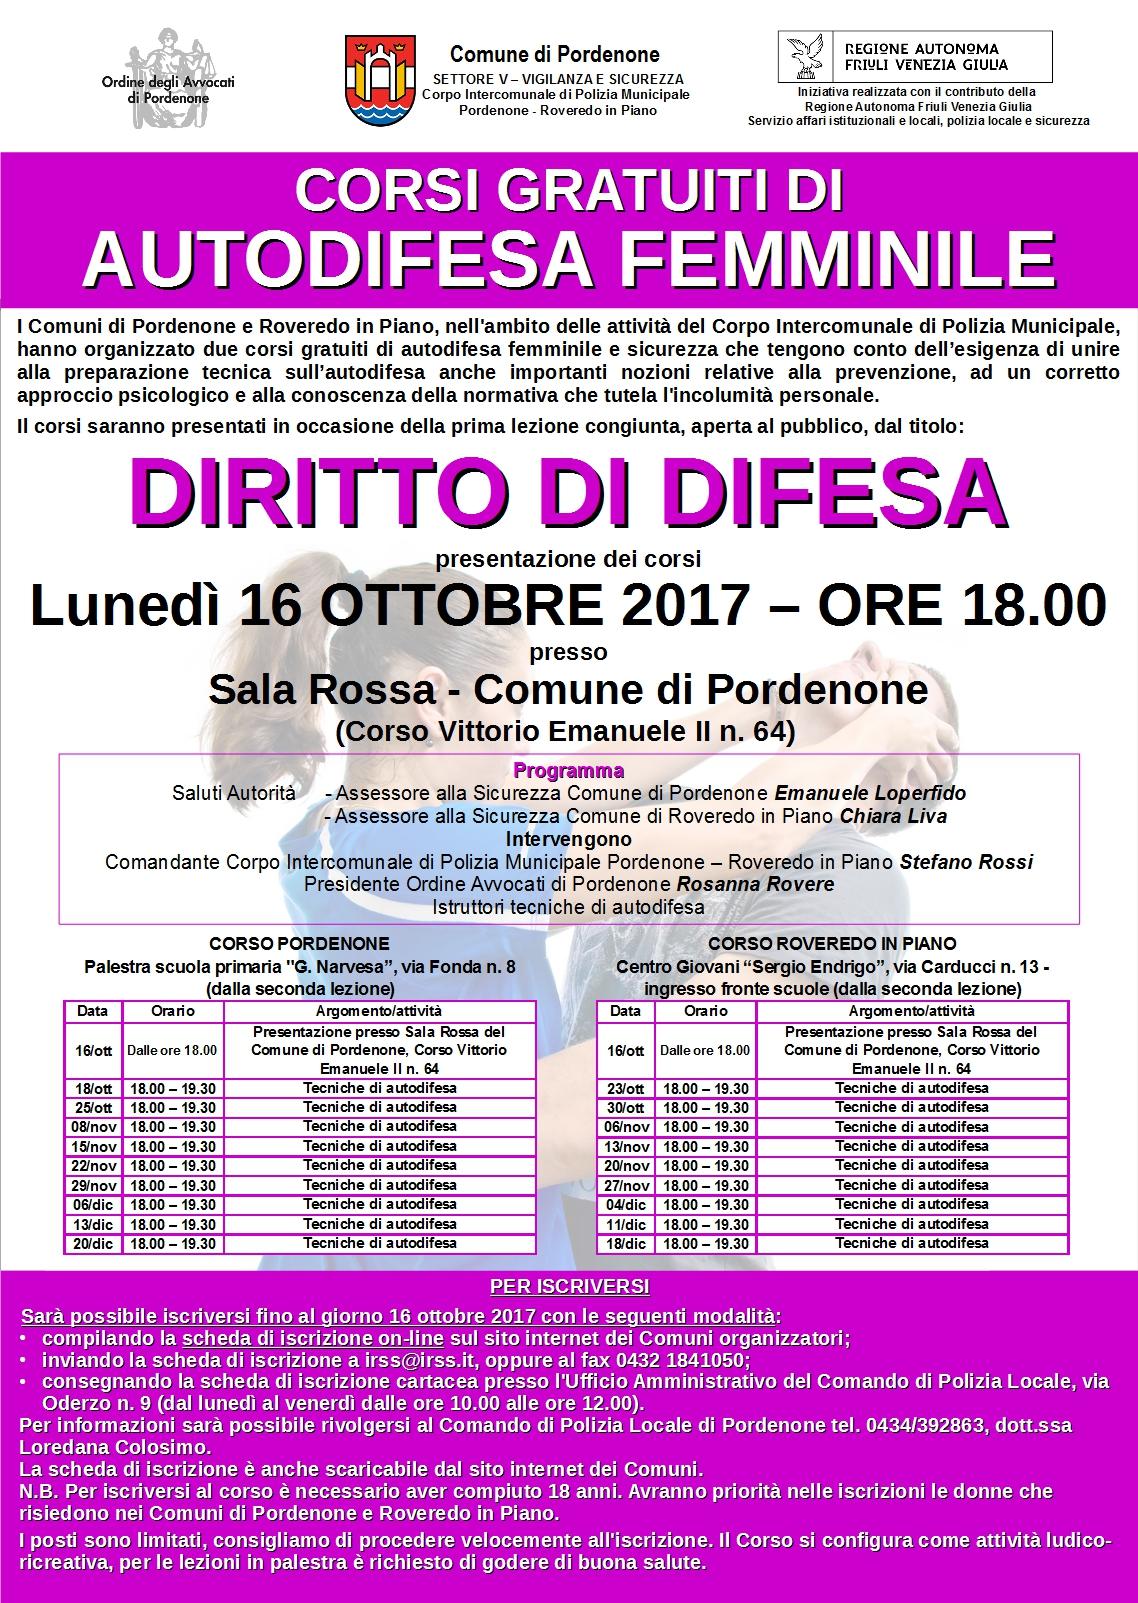 Locandina-Corso-Autodifesa-Pordenone A3+2017 v.2.jpg